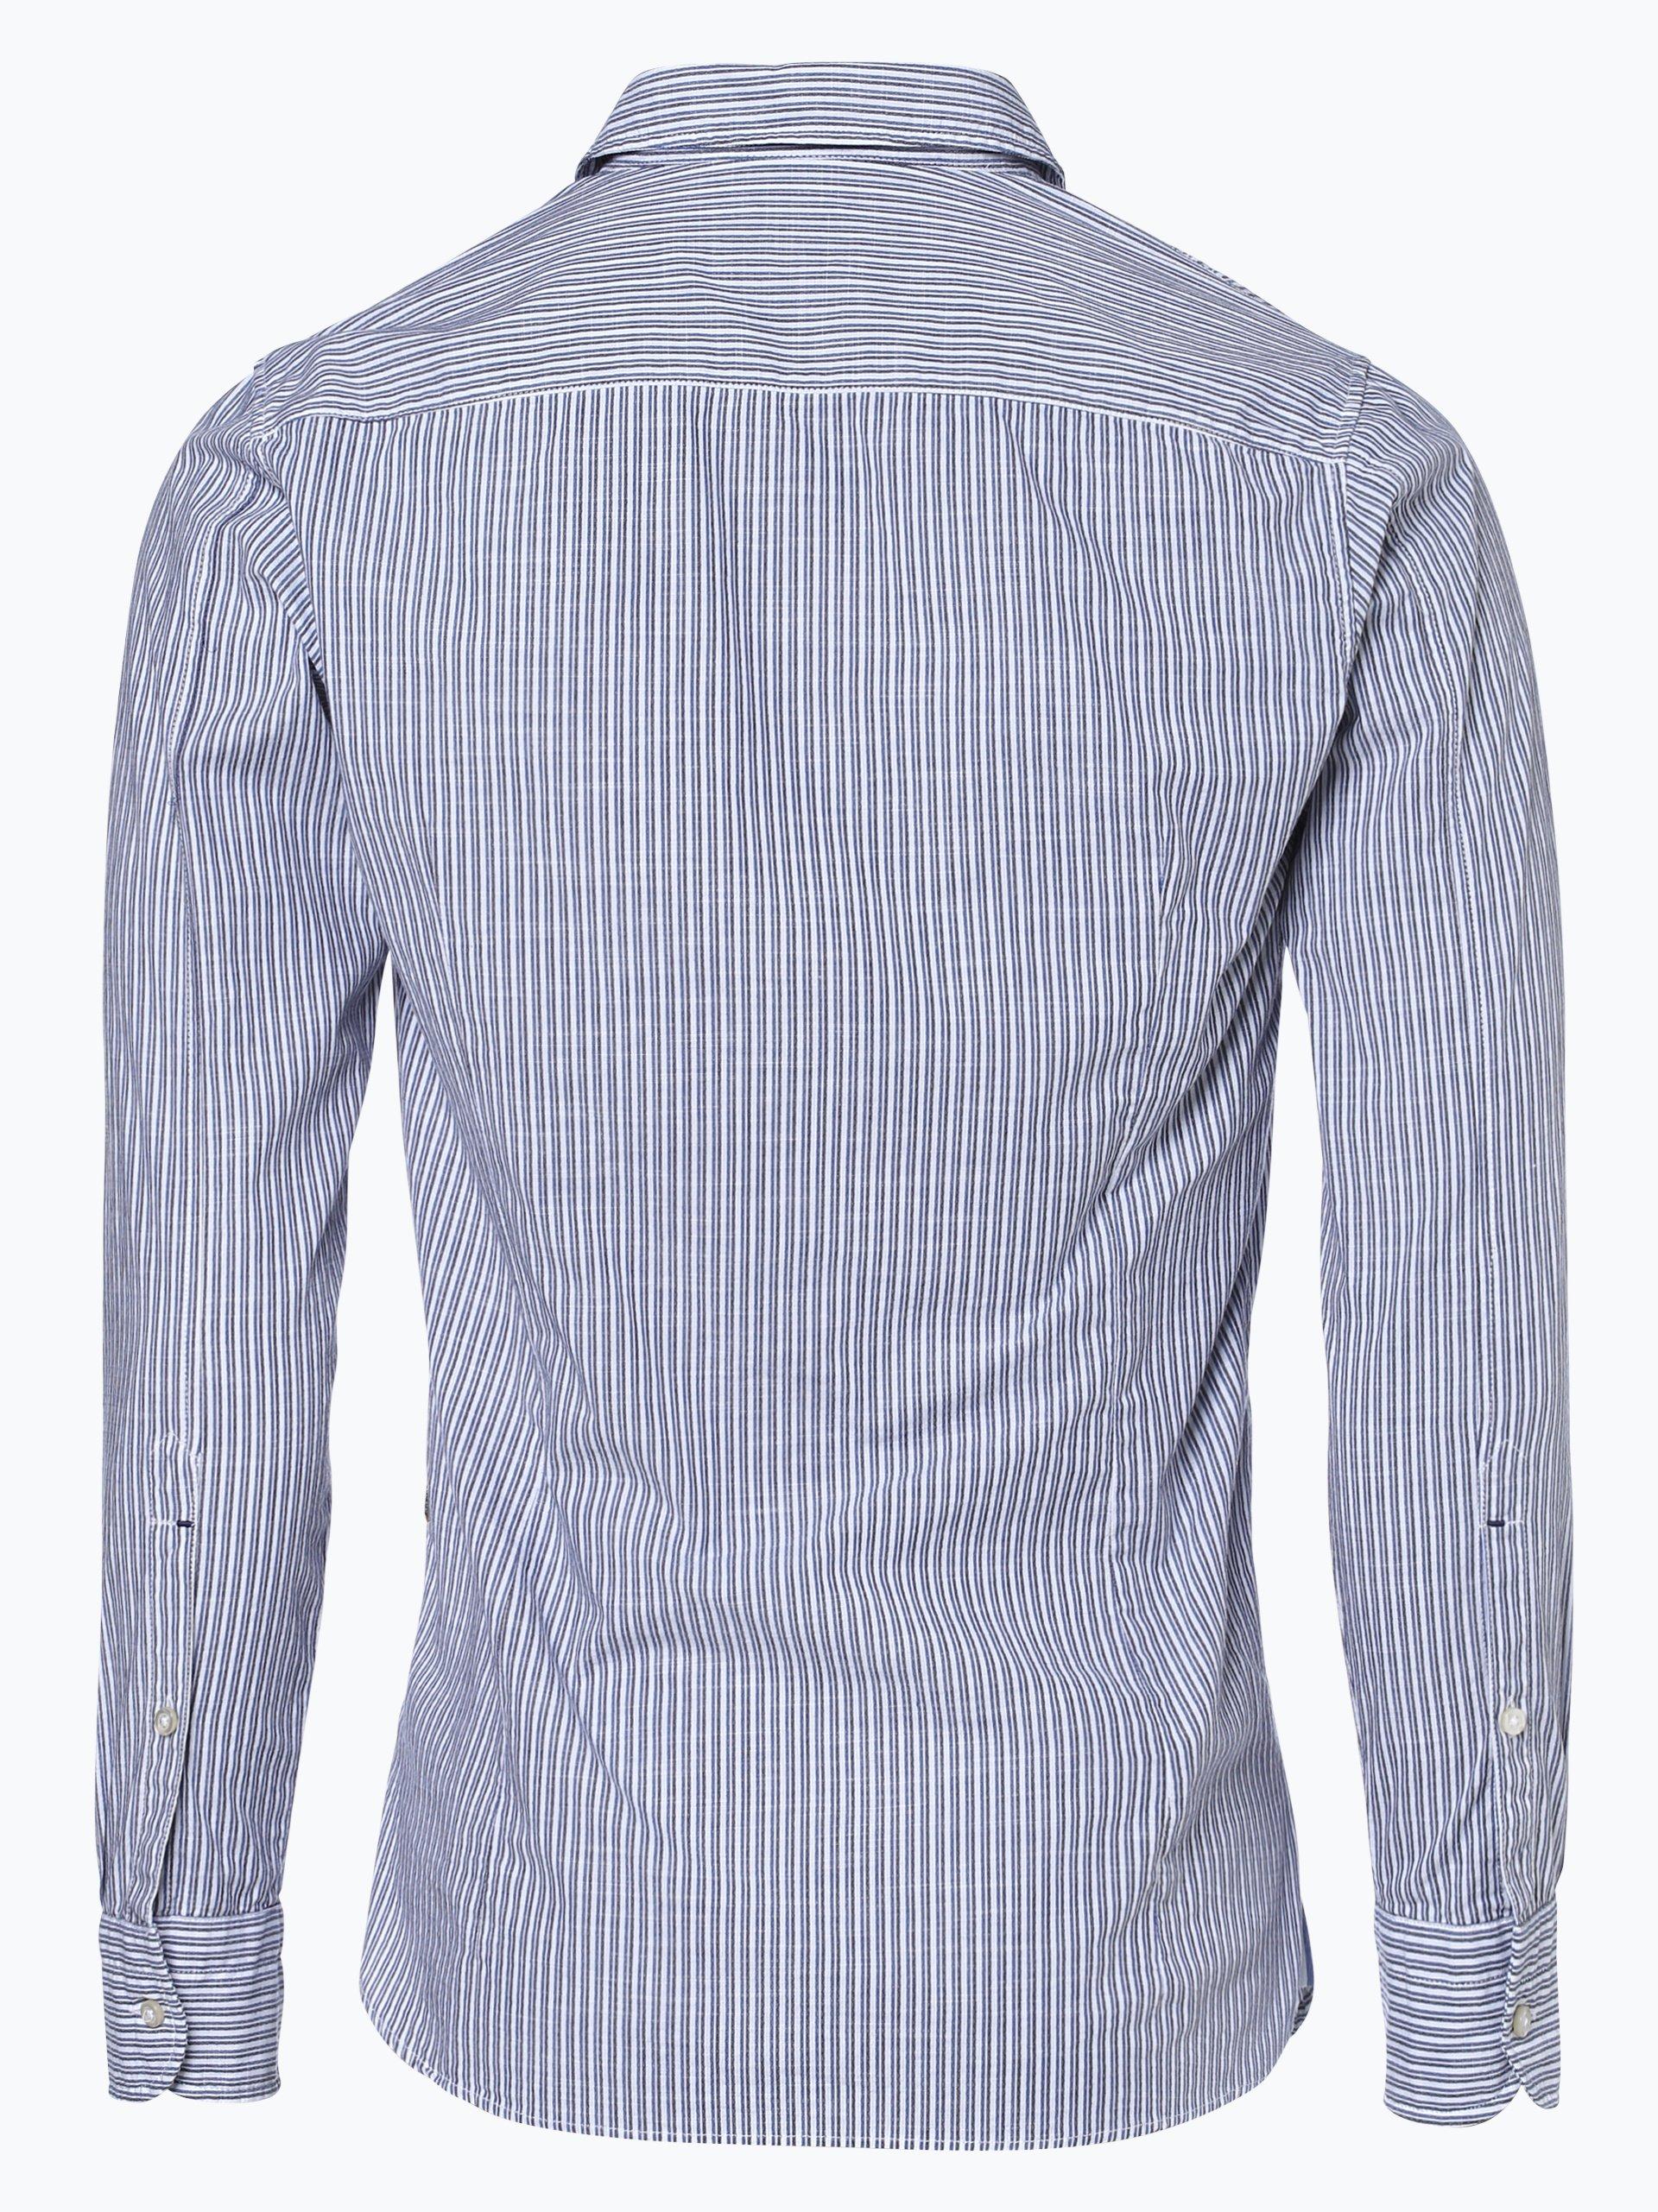 BOSS Casual Koszula męska – Cattitude_1